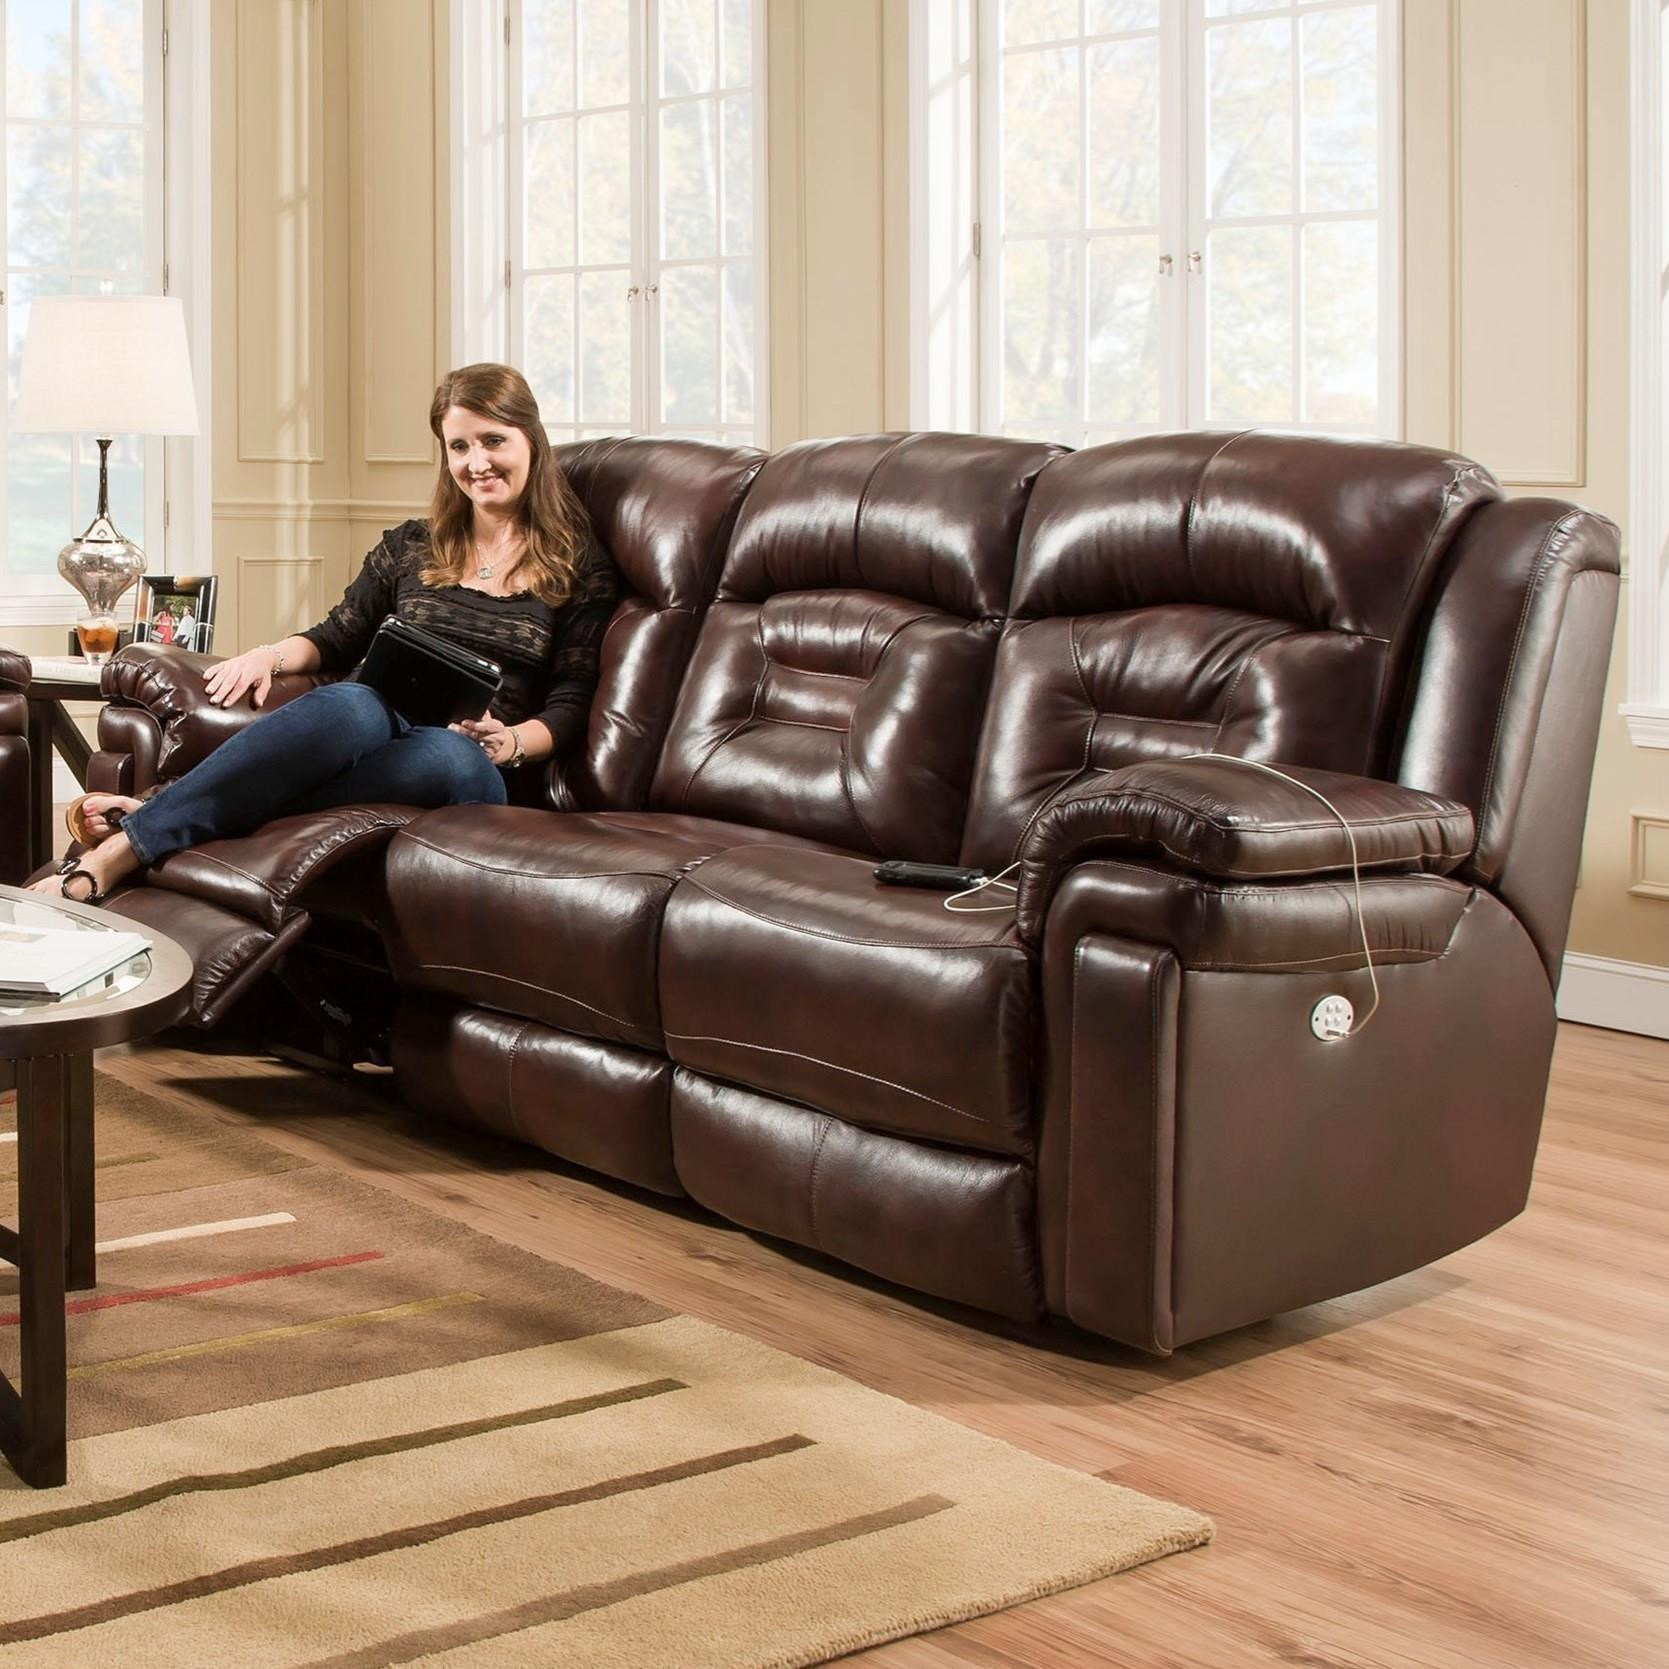 Southern Motion AvatarDouble Reclining Power Headrest Sofa